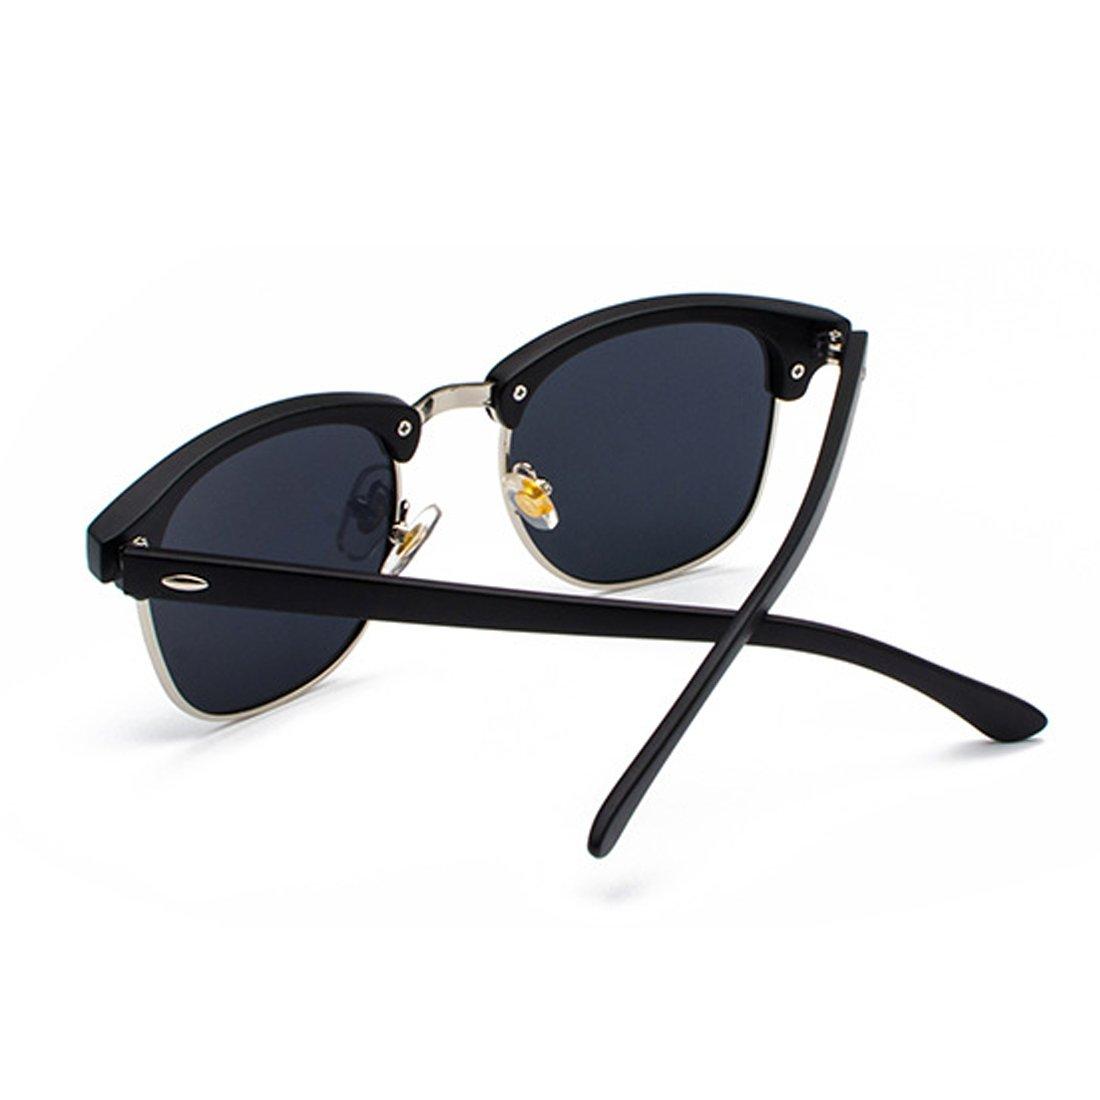 Inlefen Women Men Retro Sunglasses Half Frame With Polarized Lens UV400